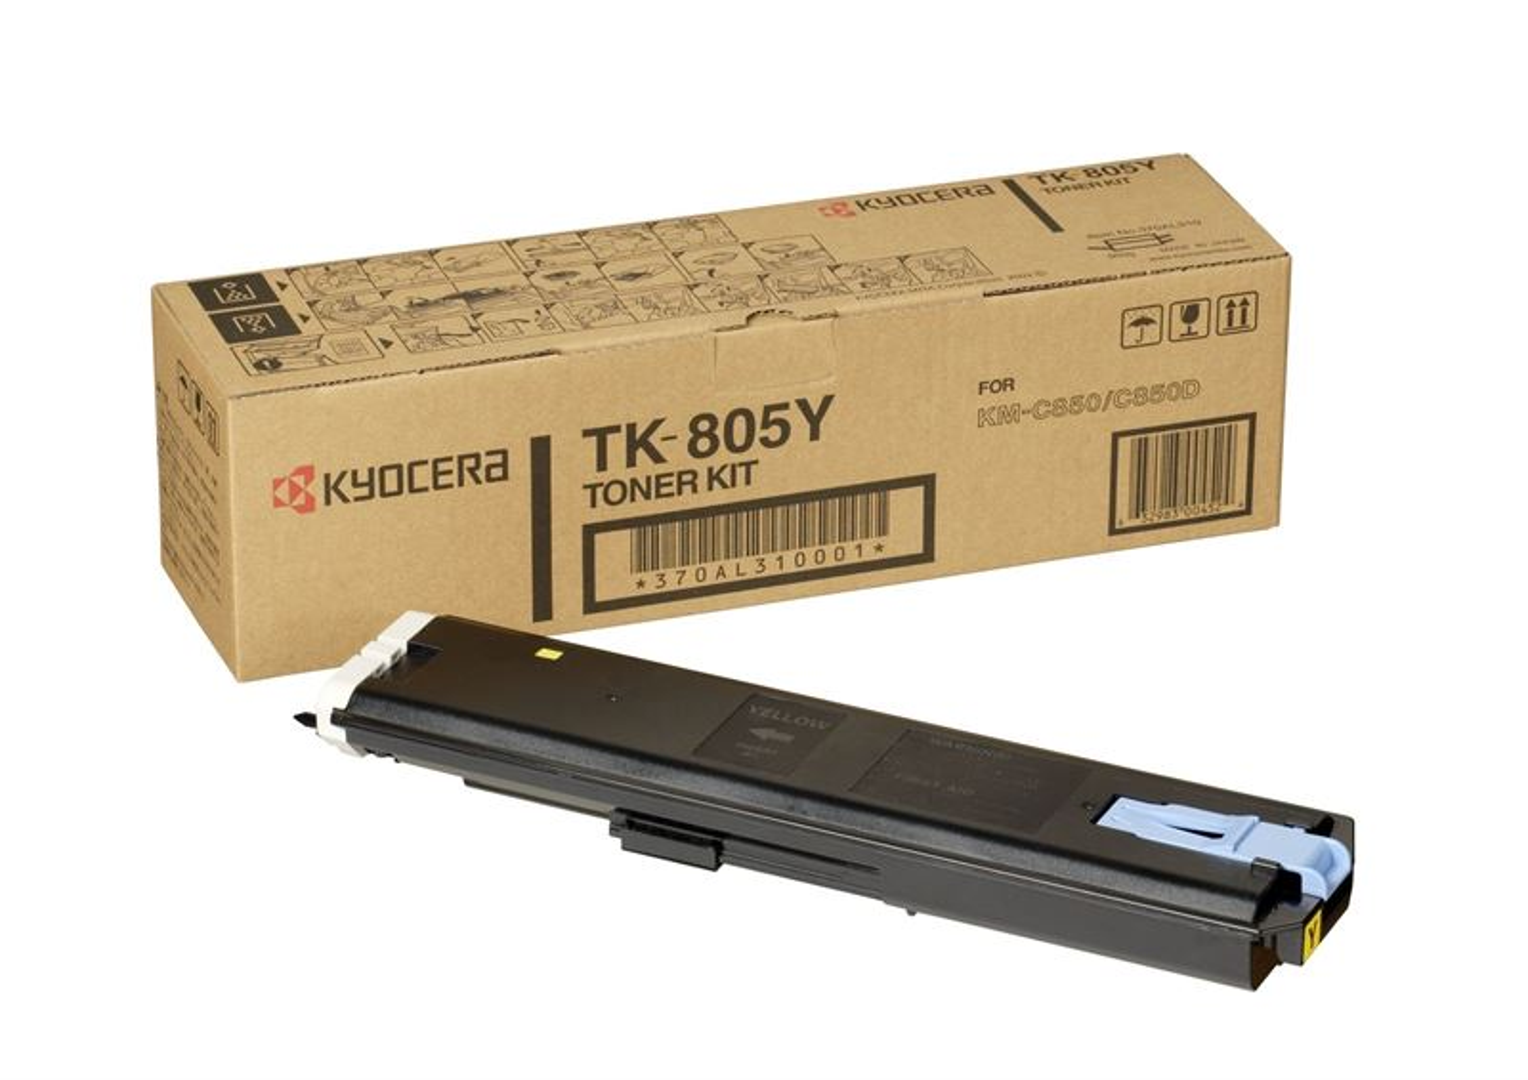 Kyocera Toner Original für KM-C805, yellow